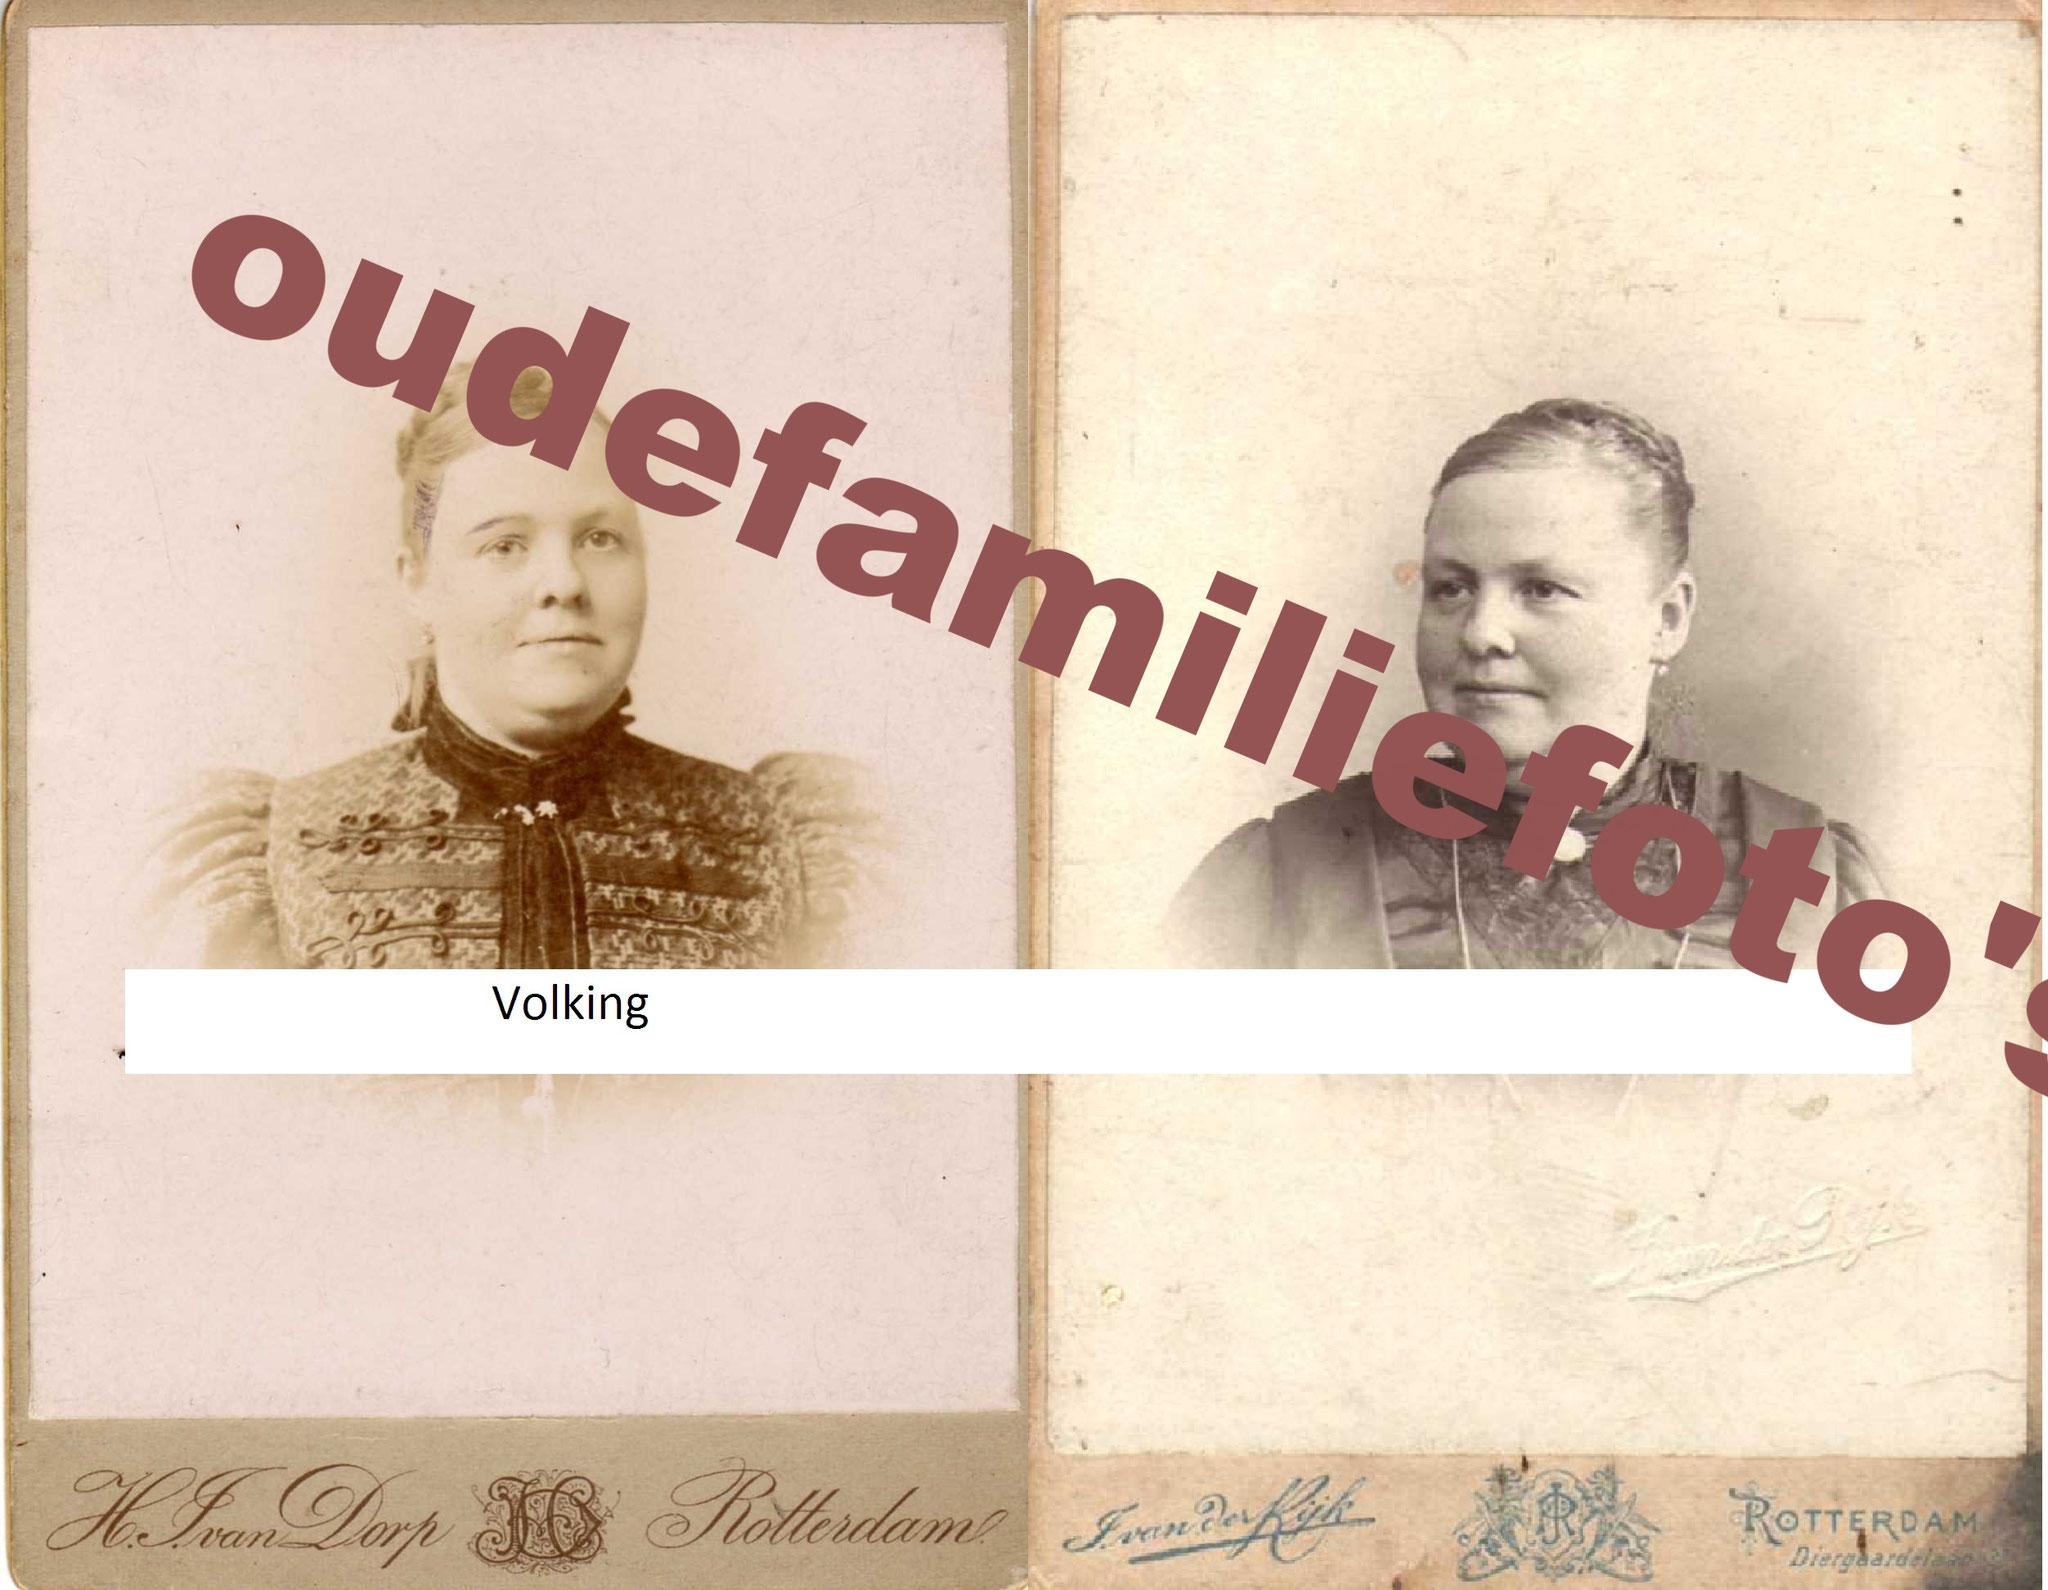 Volking, Geertruida. Geb: 22-7-1857 Rotterdam. Gehuwd met Johannes Poels. € 4,00